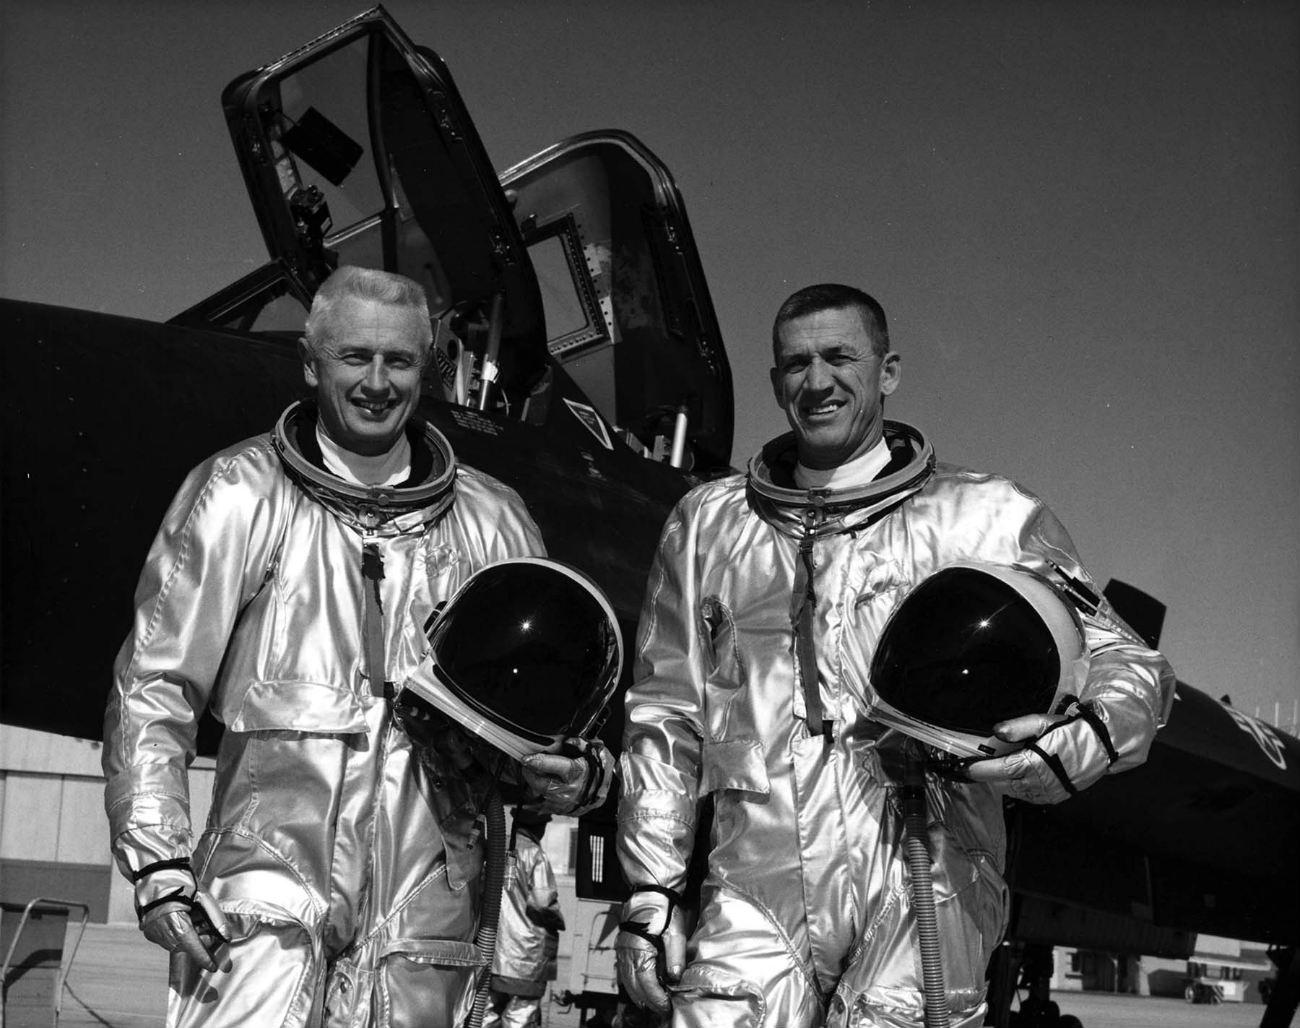 Lockheed YF-12 - Speed record flight